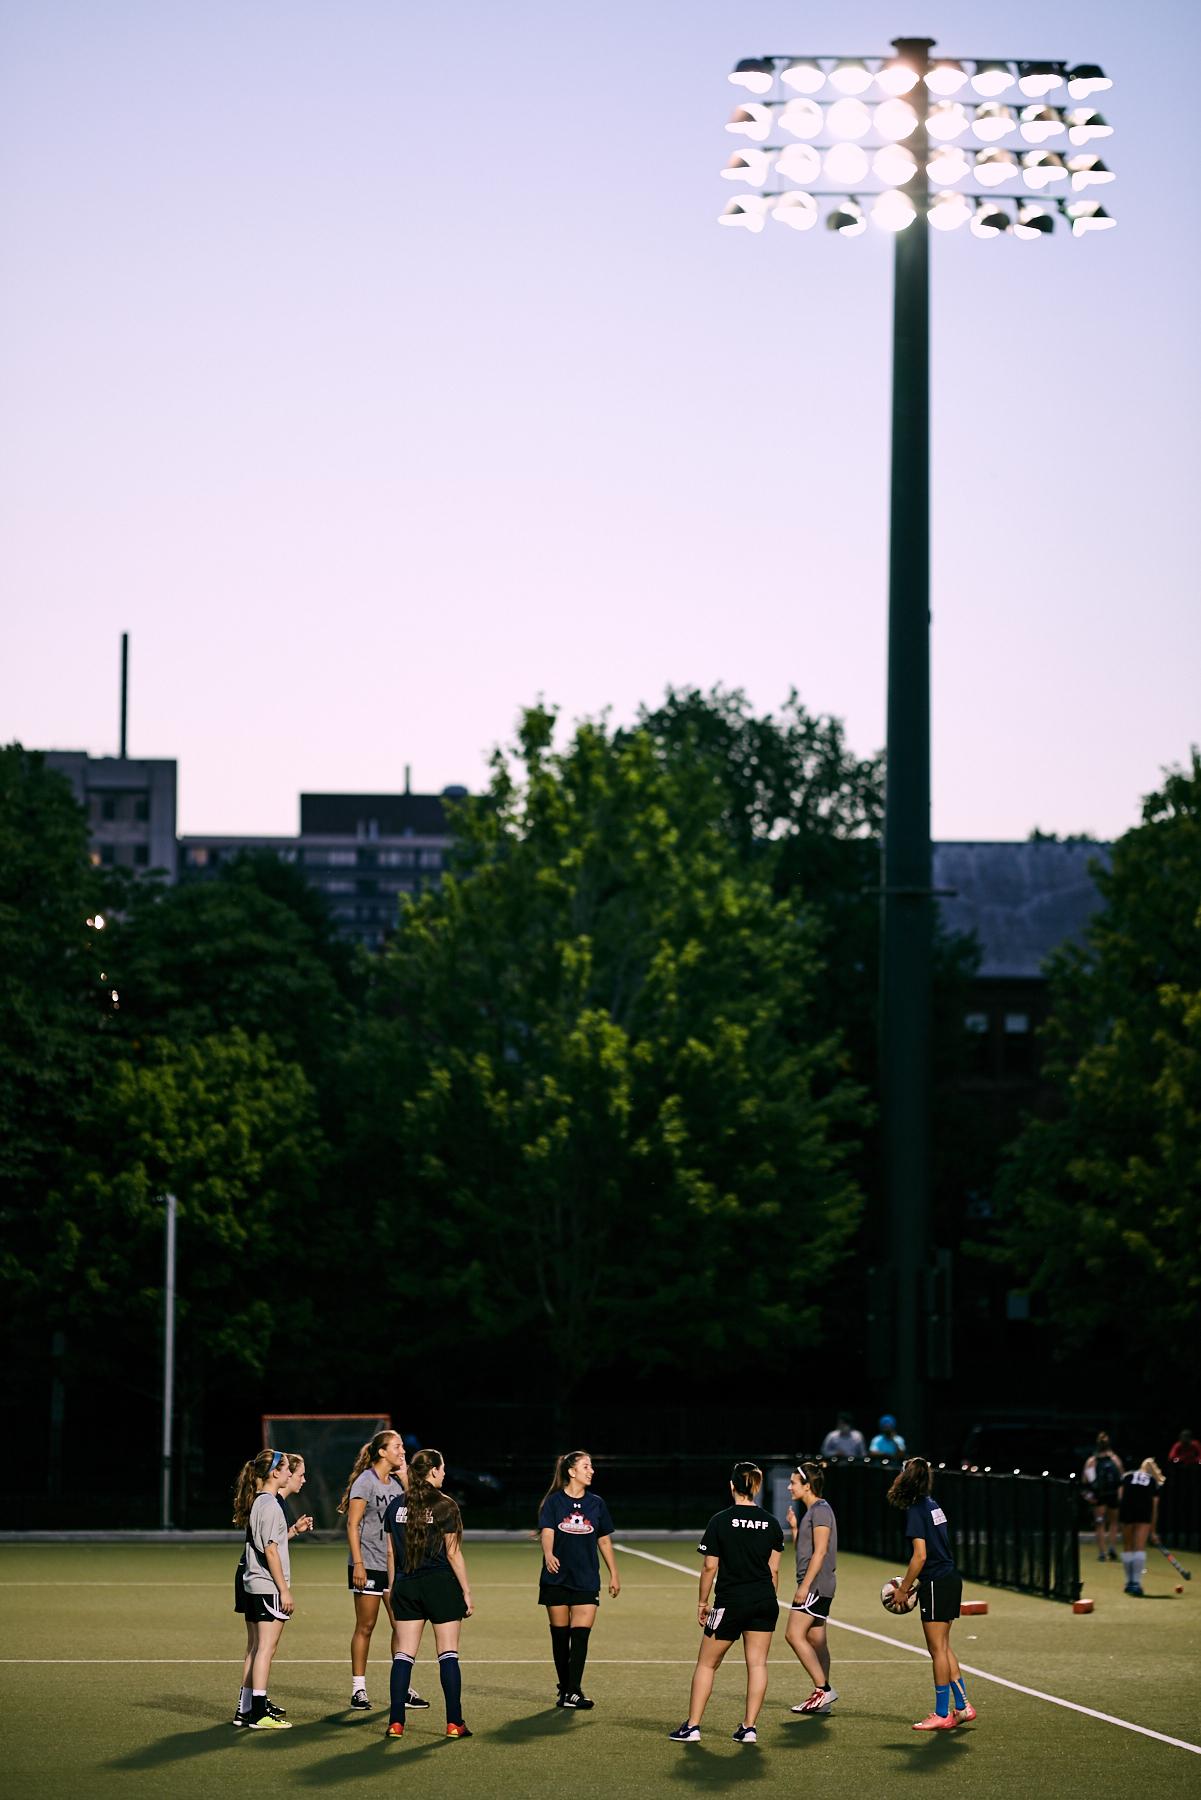 Summer Soccer Practice